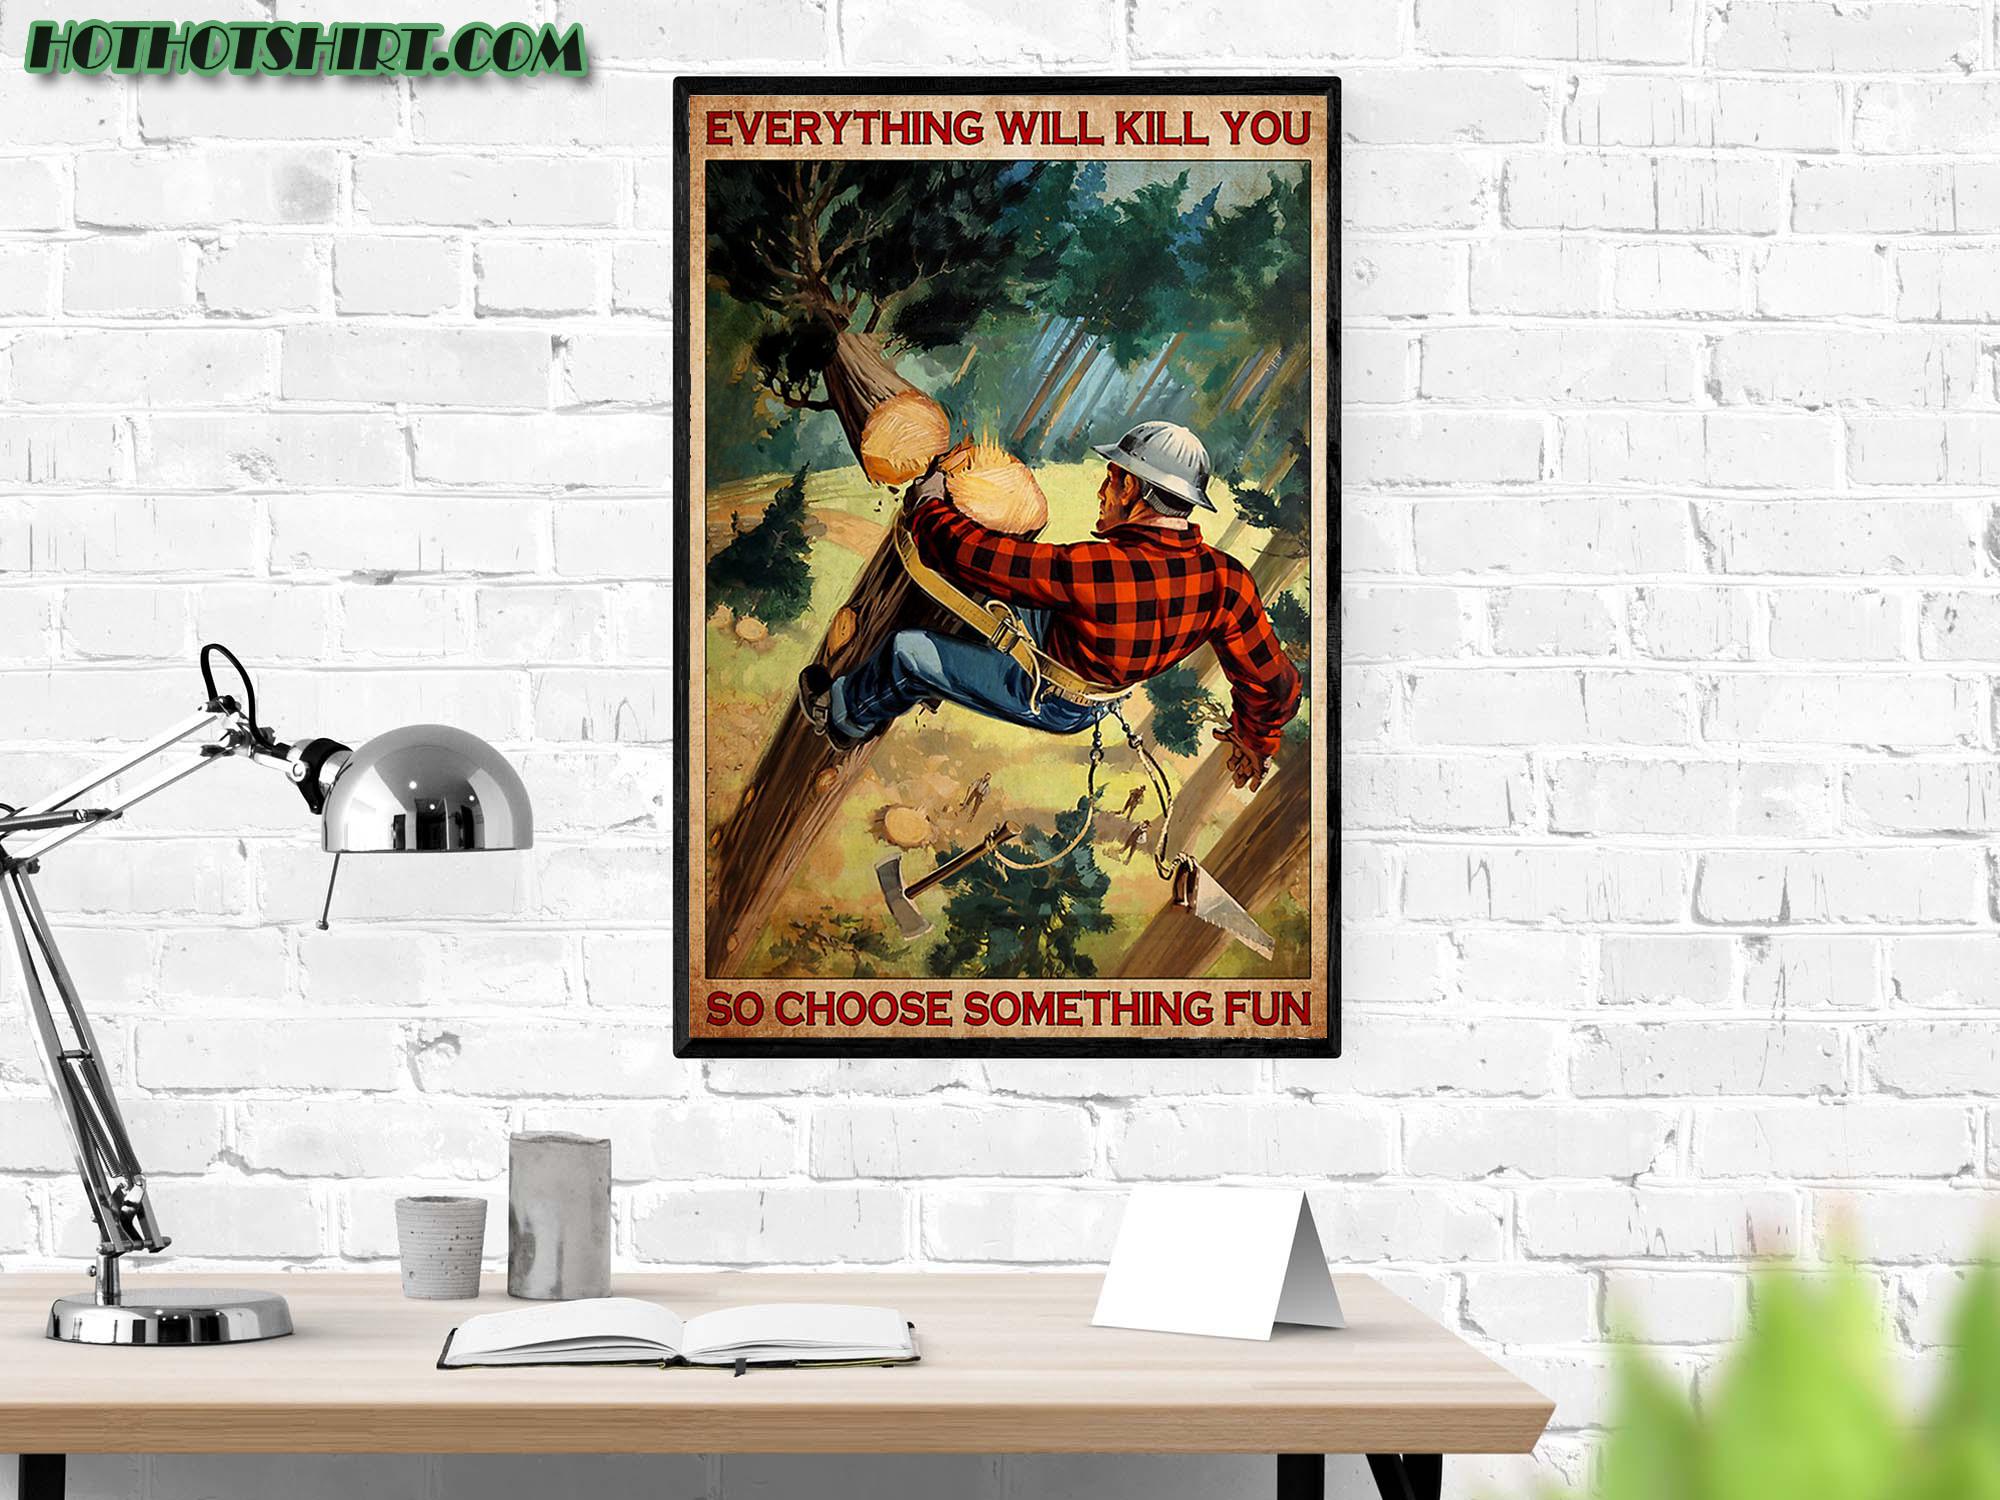 Lumberjack everything will kill you so choose something fun poster 2